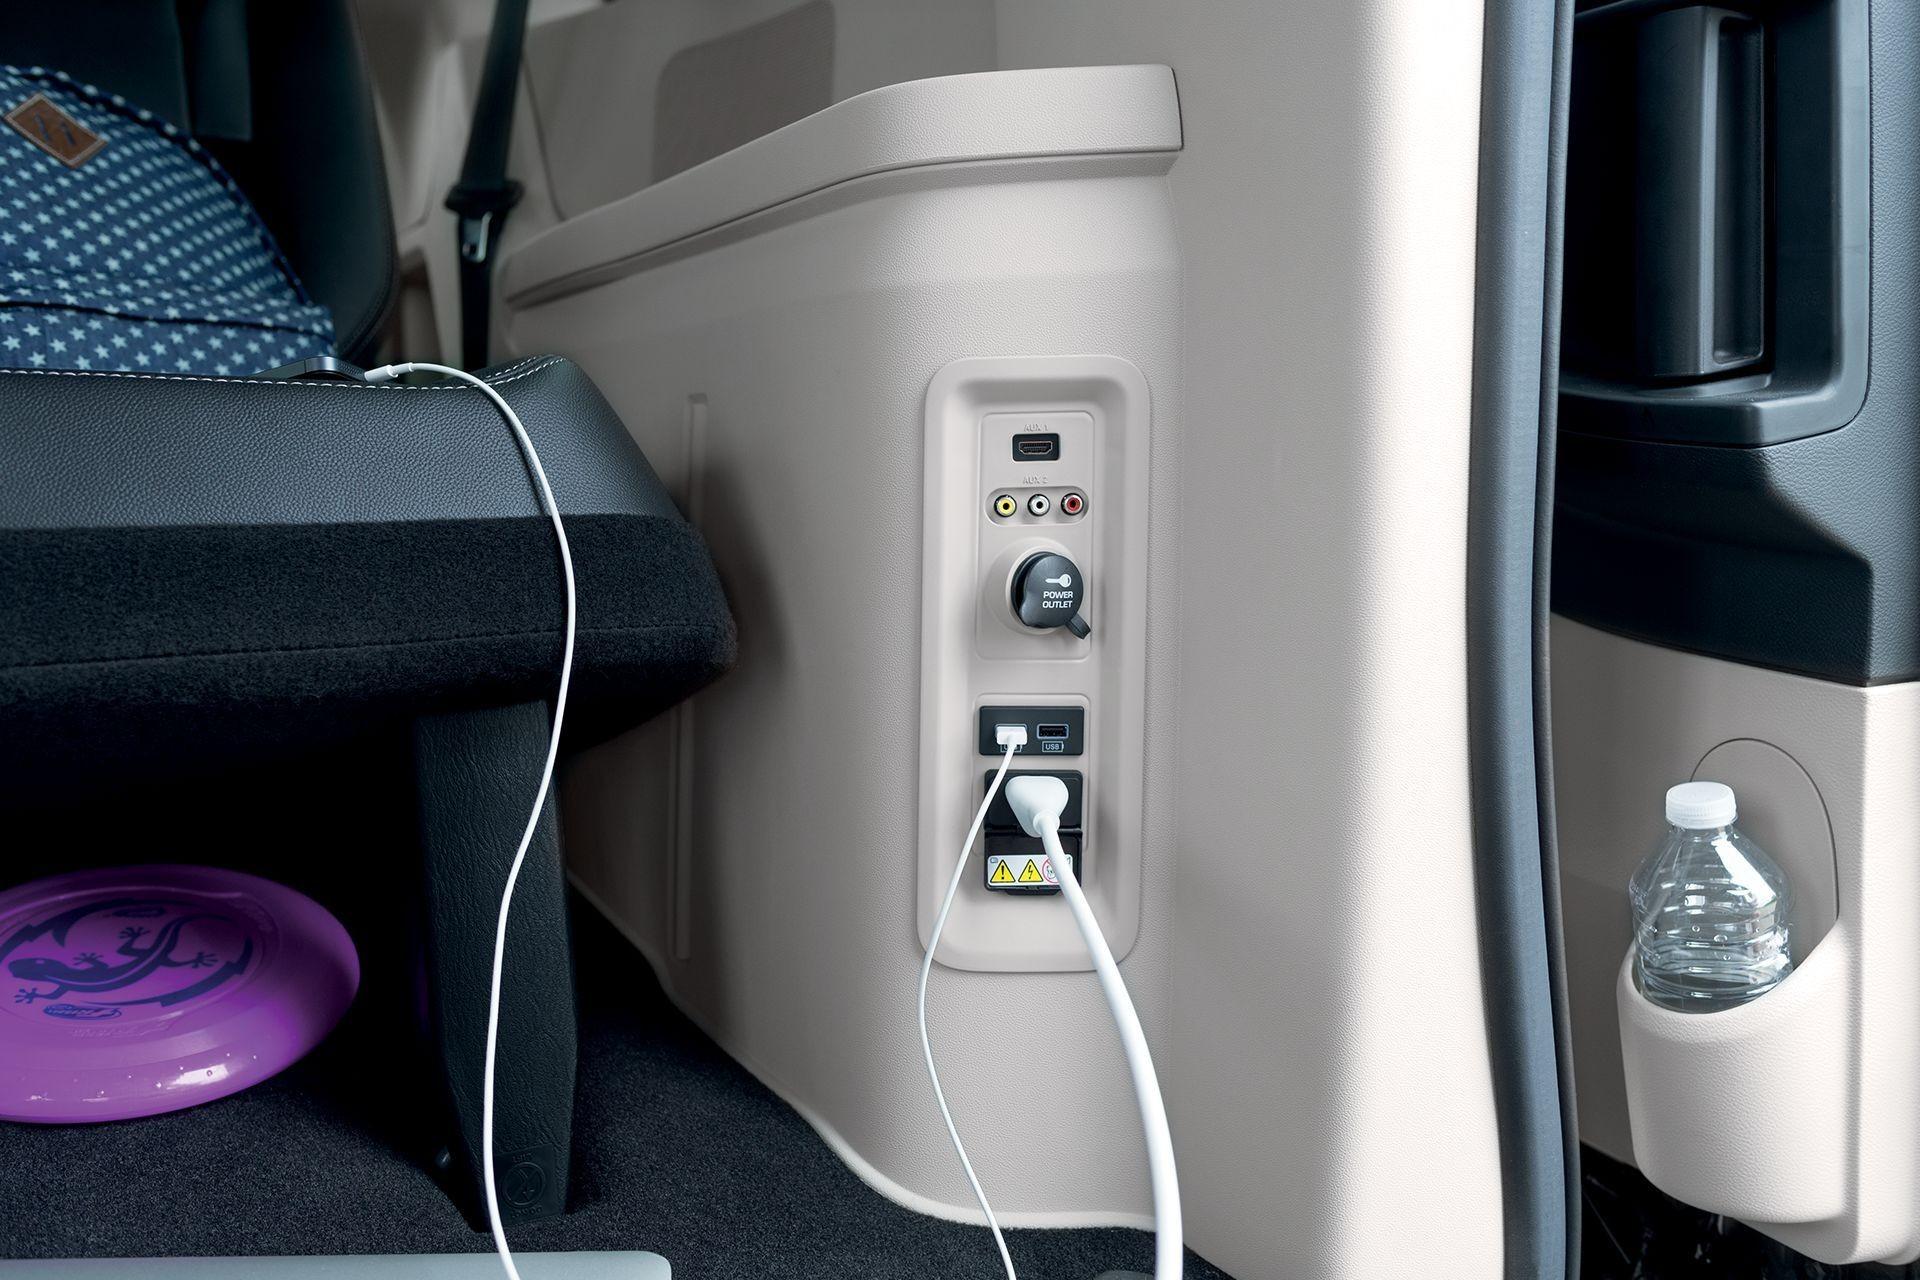 dodge caravan usb ports 2 Dodge Caravan Usb Port Release  Chrysler minivan, New cars  - dodge caravan usb ports